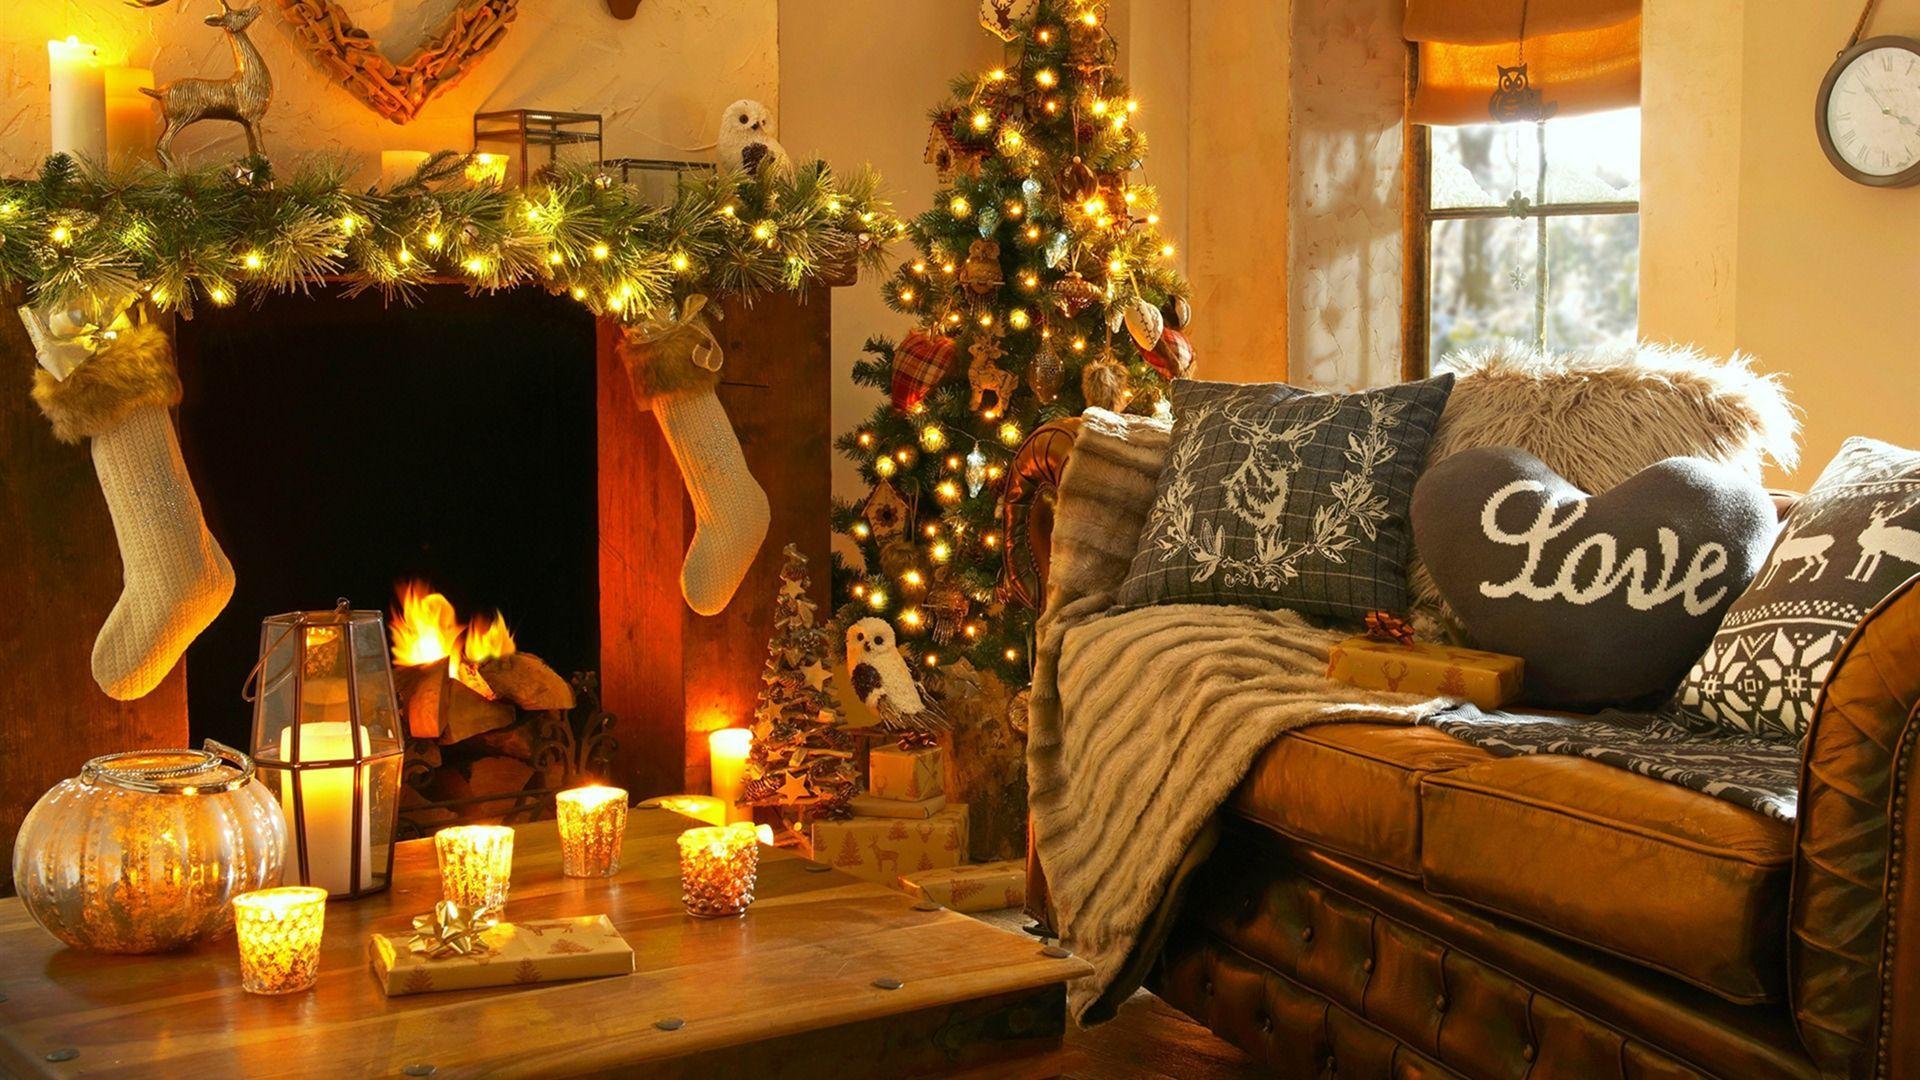 Christmas Fireplace Comfort new wallpaper